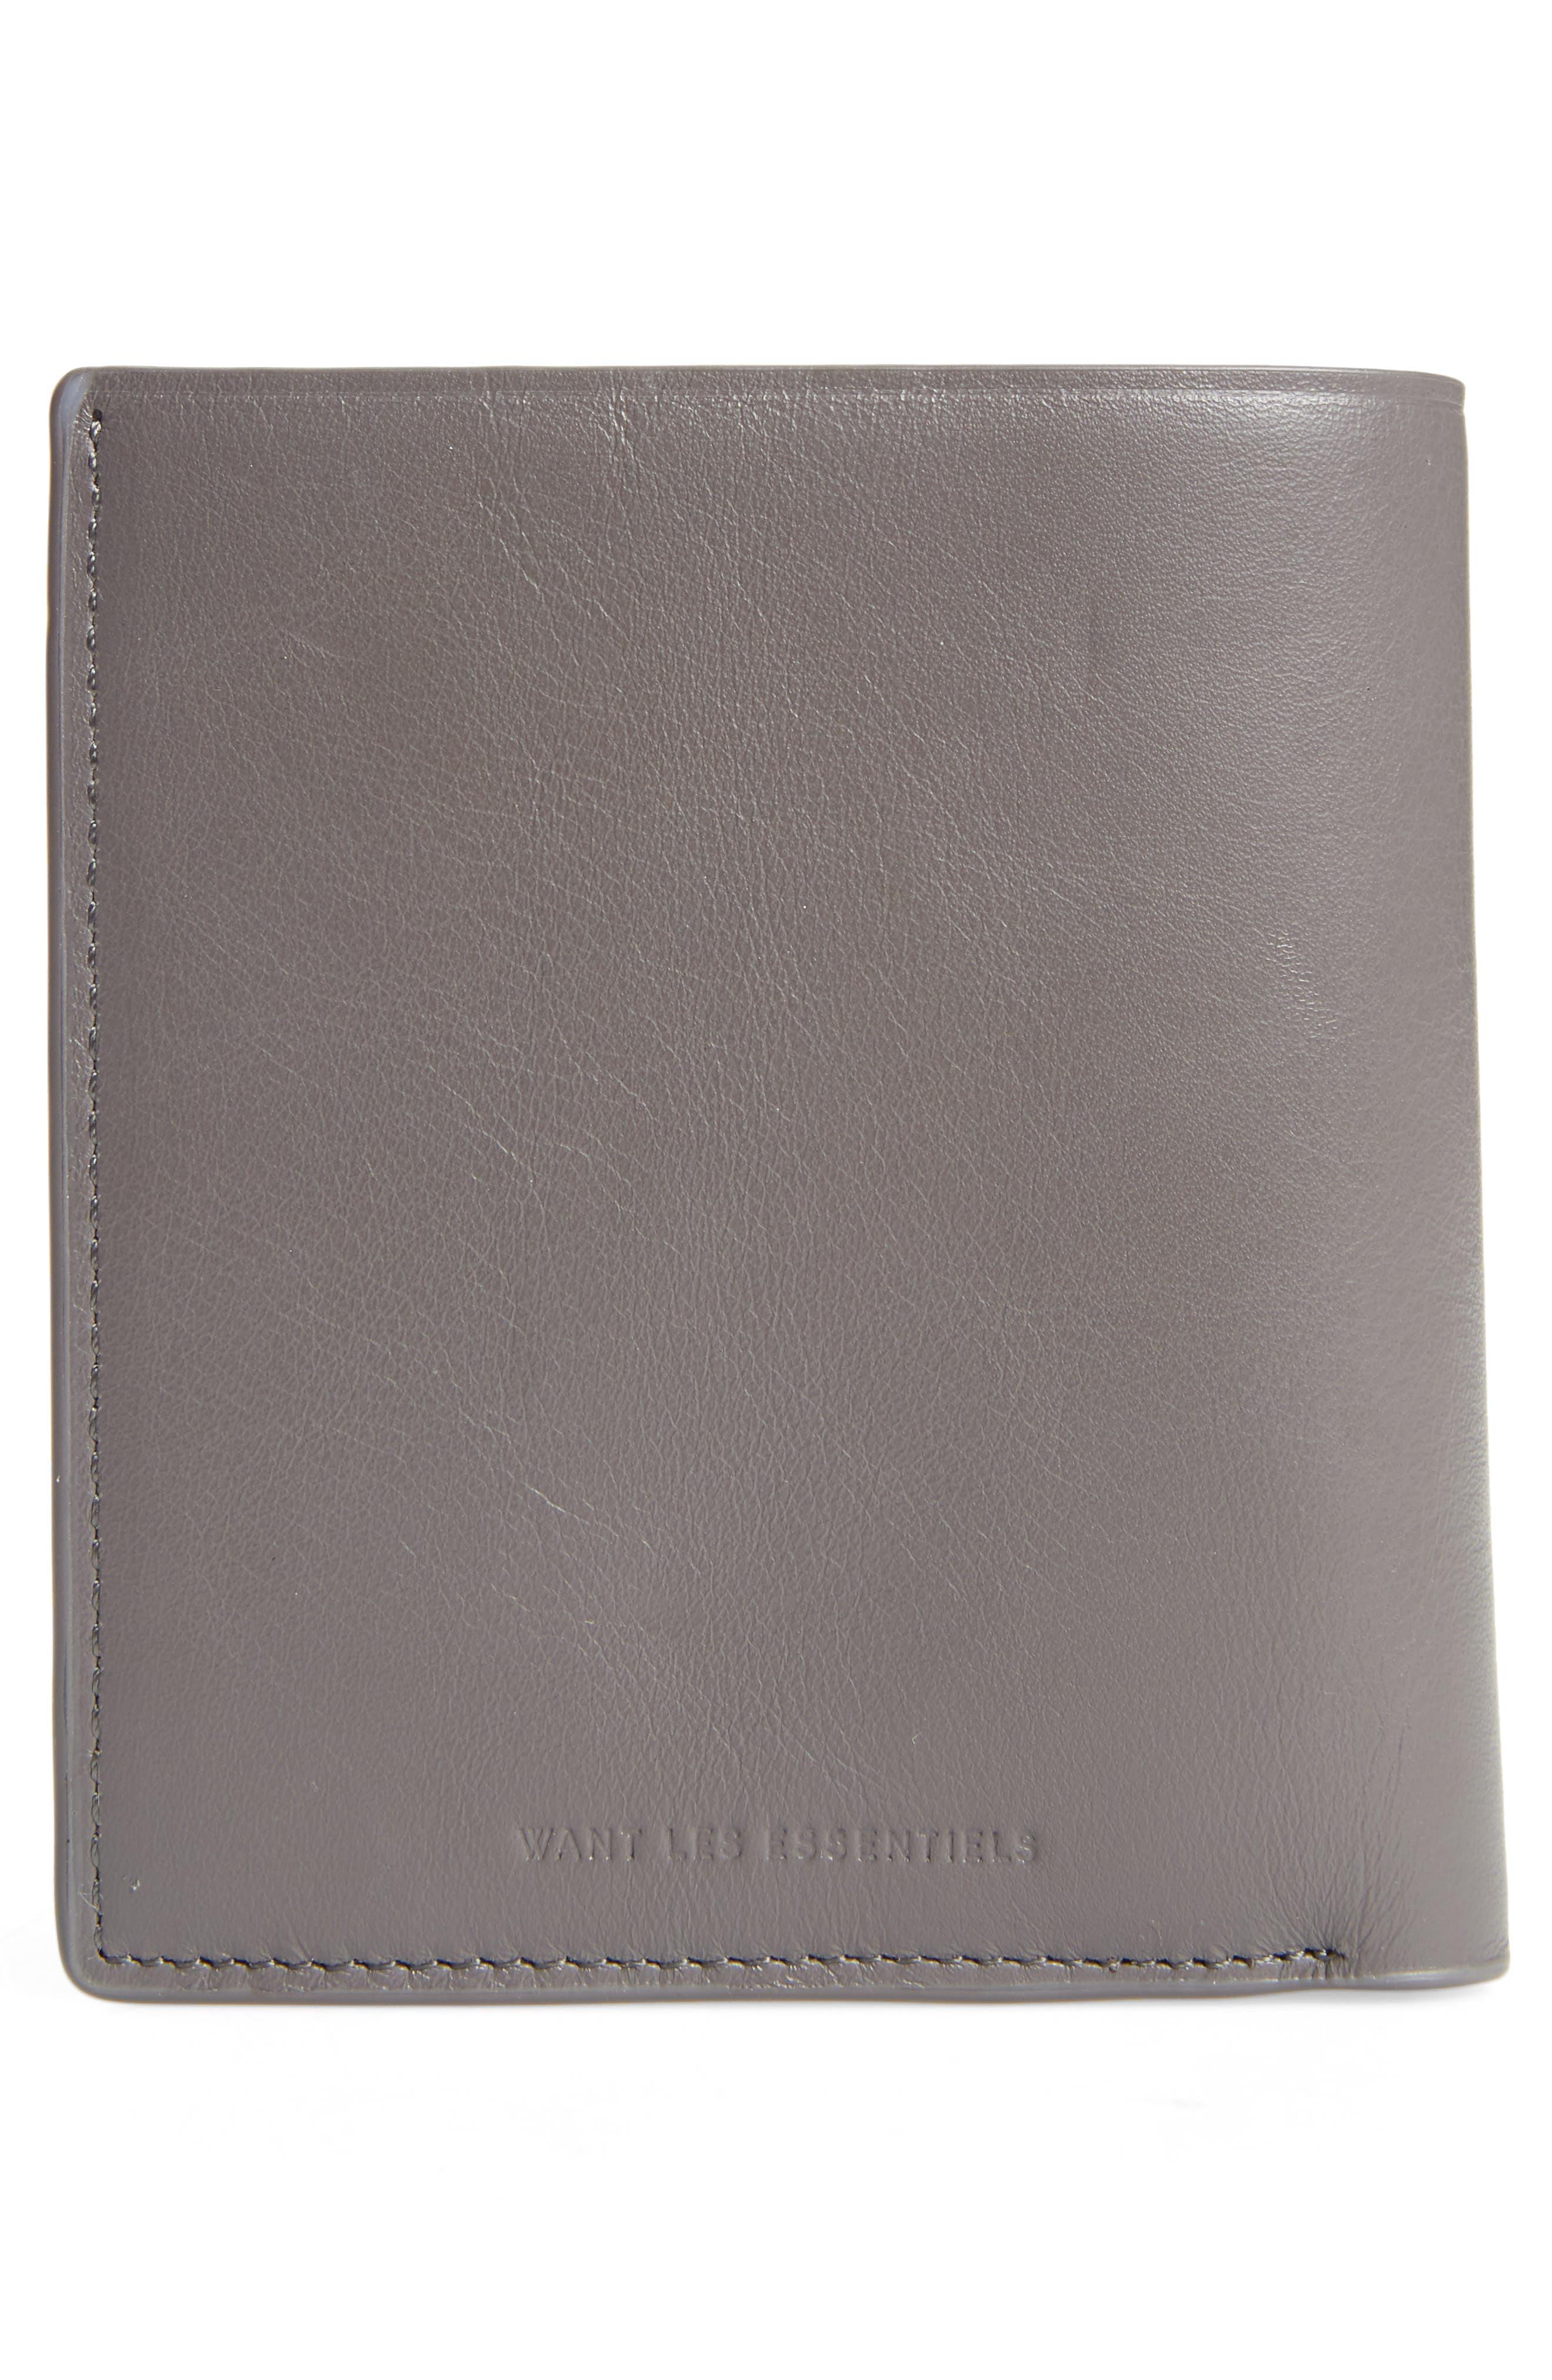 Bradley Bifold Leather Wallet,                             Alternate thumbnail 3, color,                             032